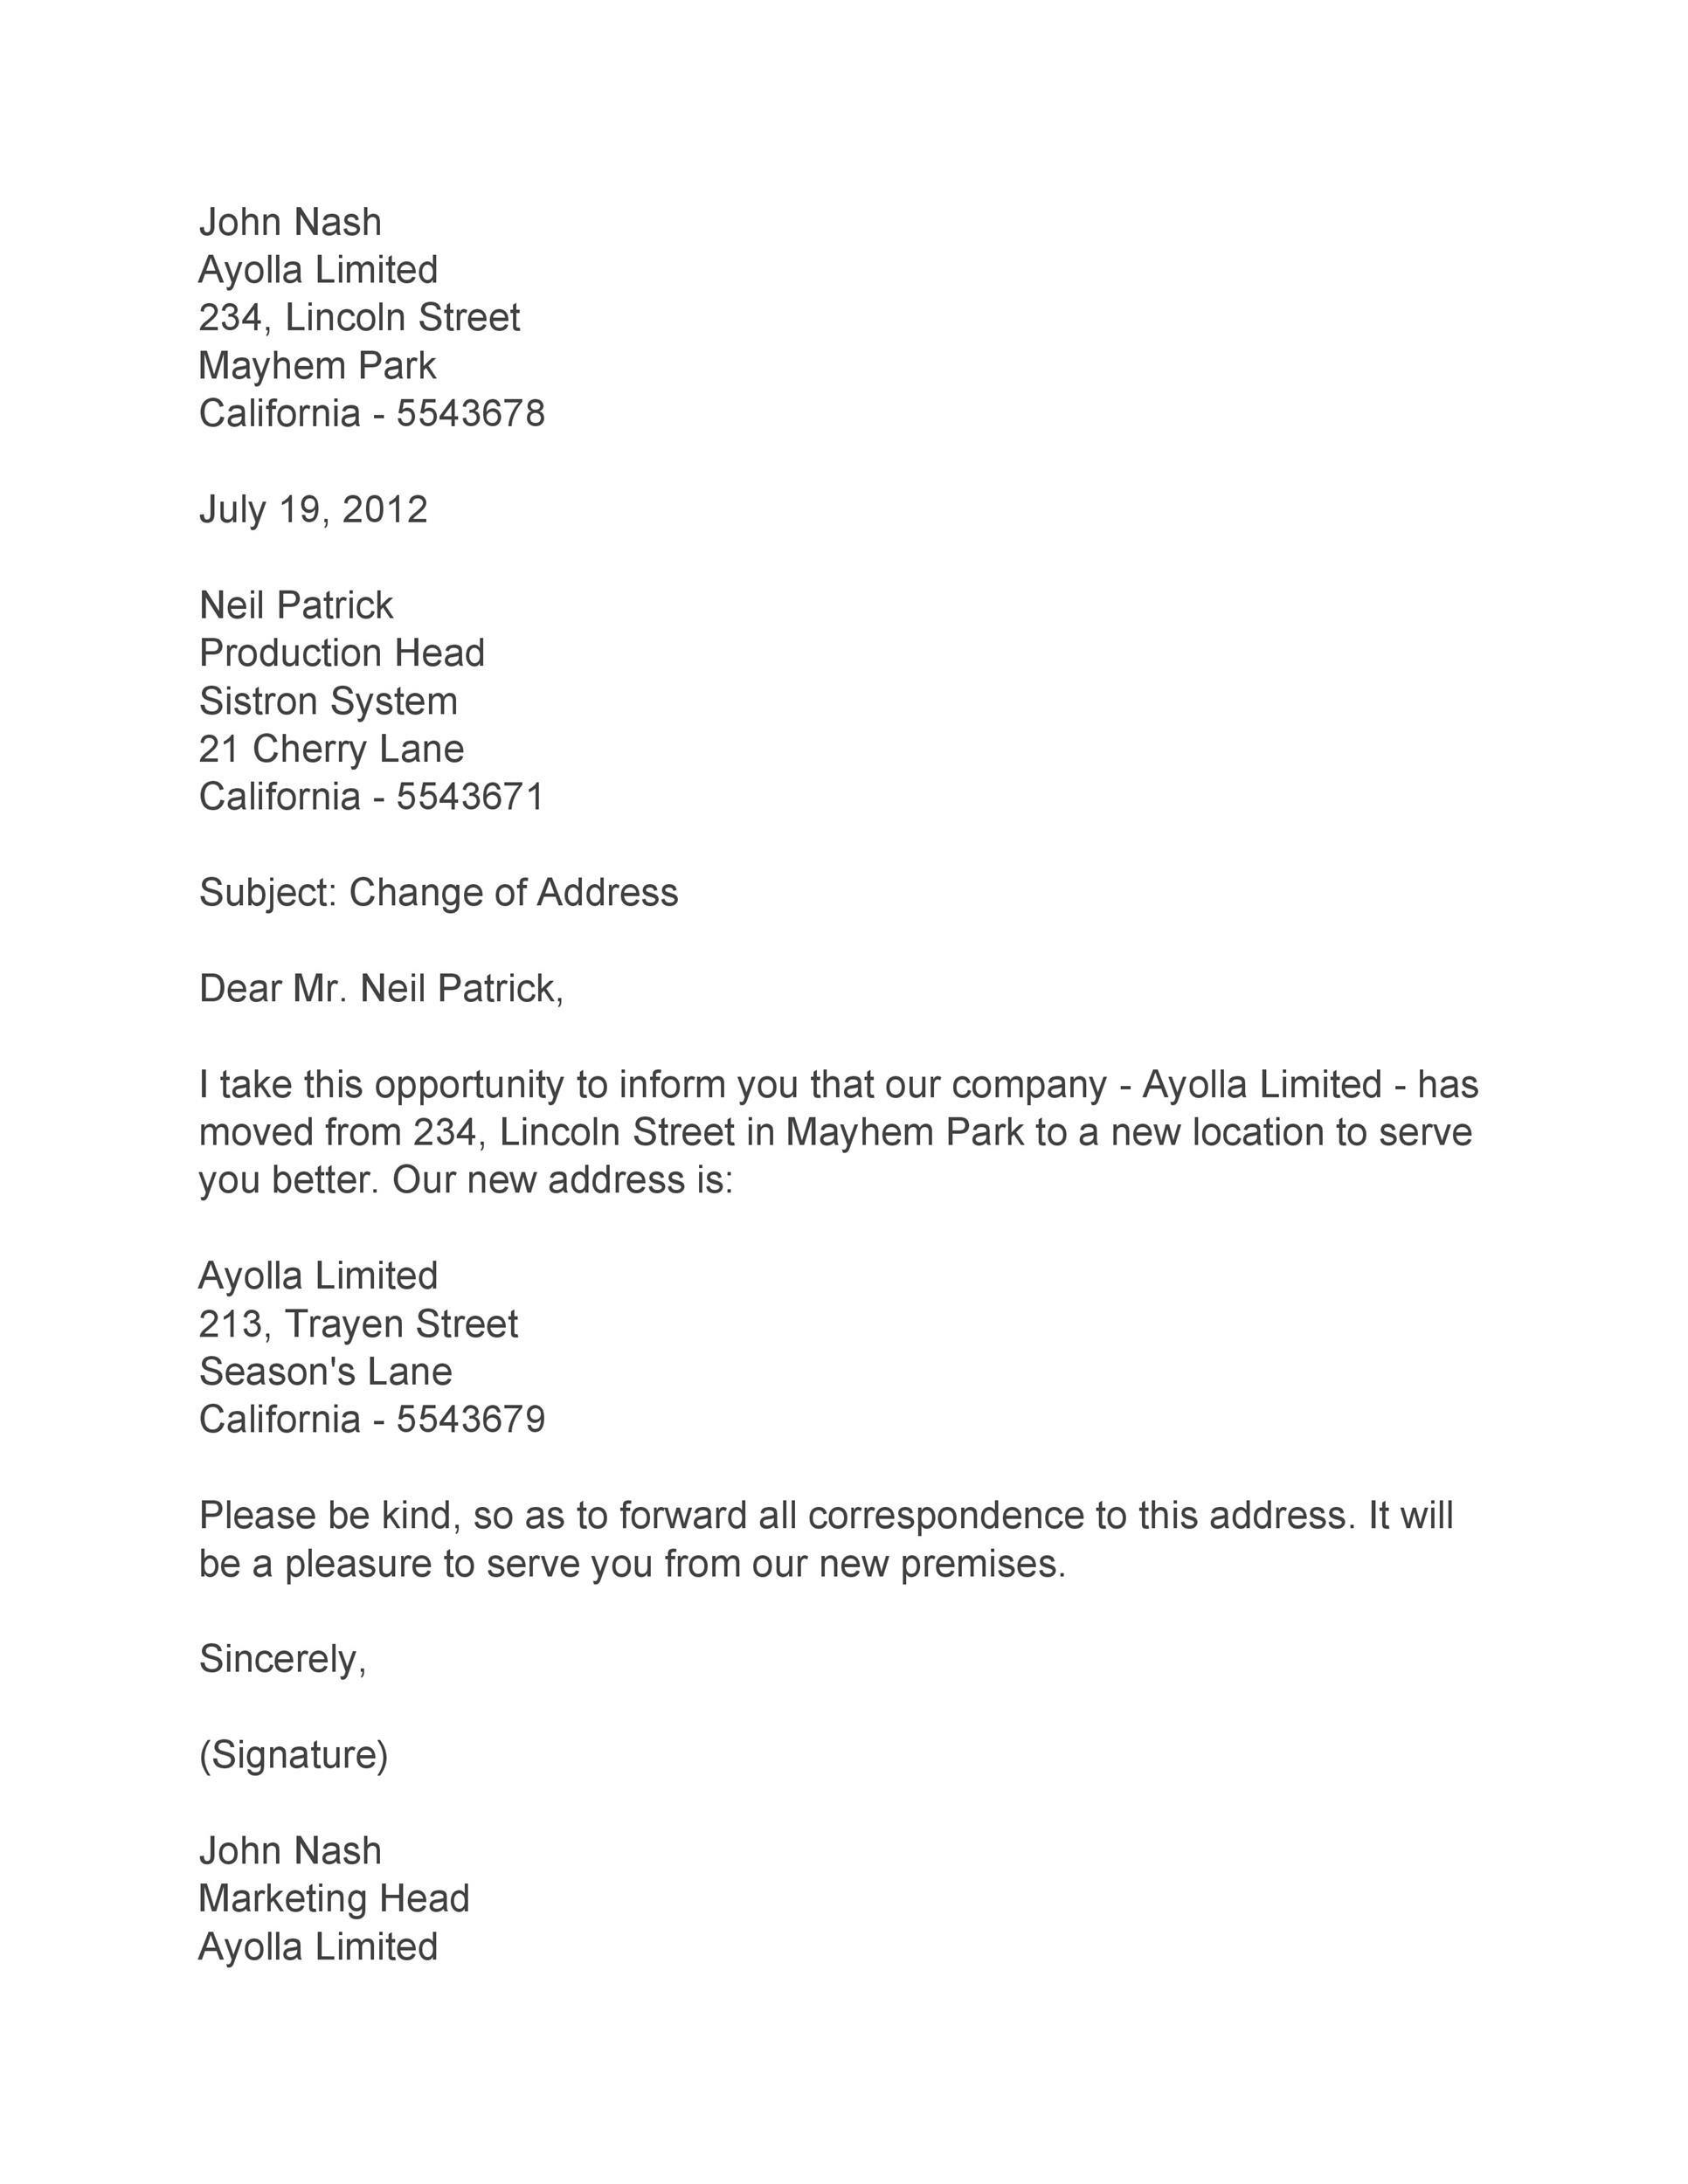 Free change of address letter 15